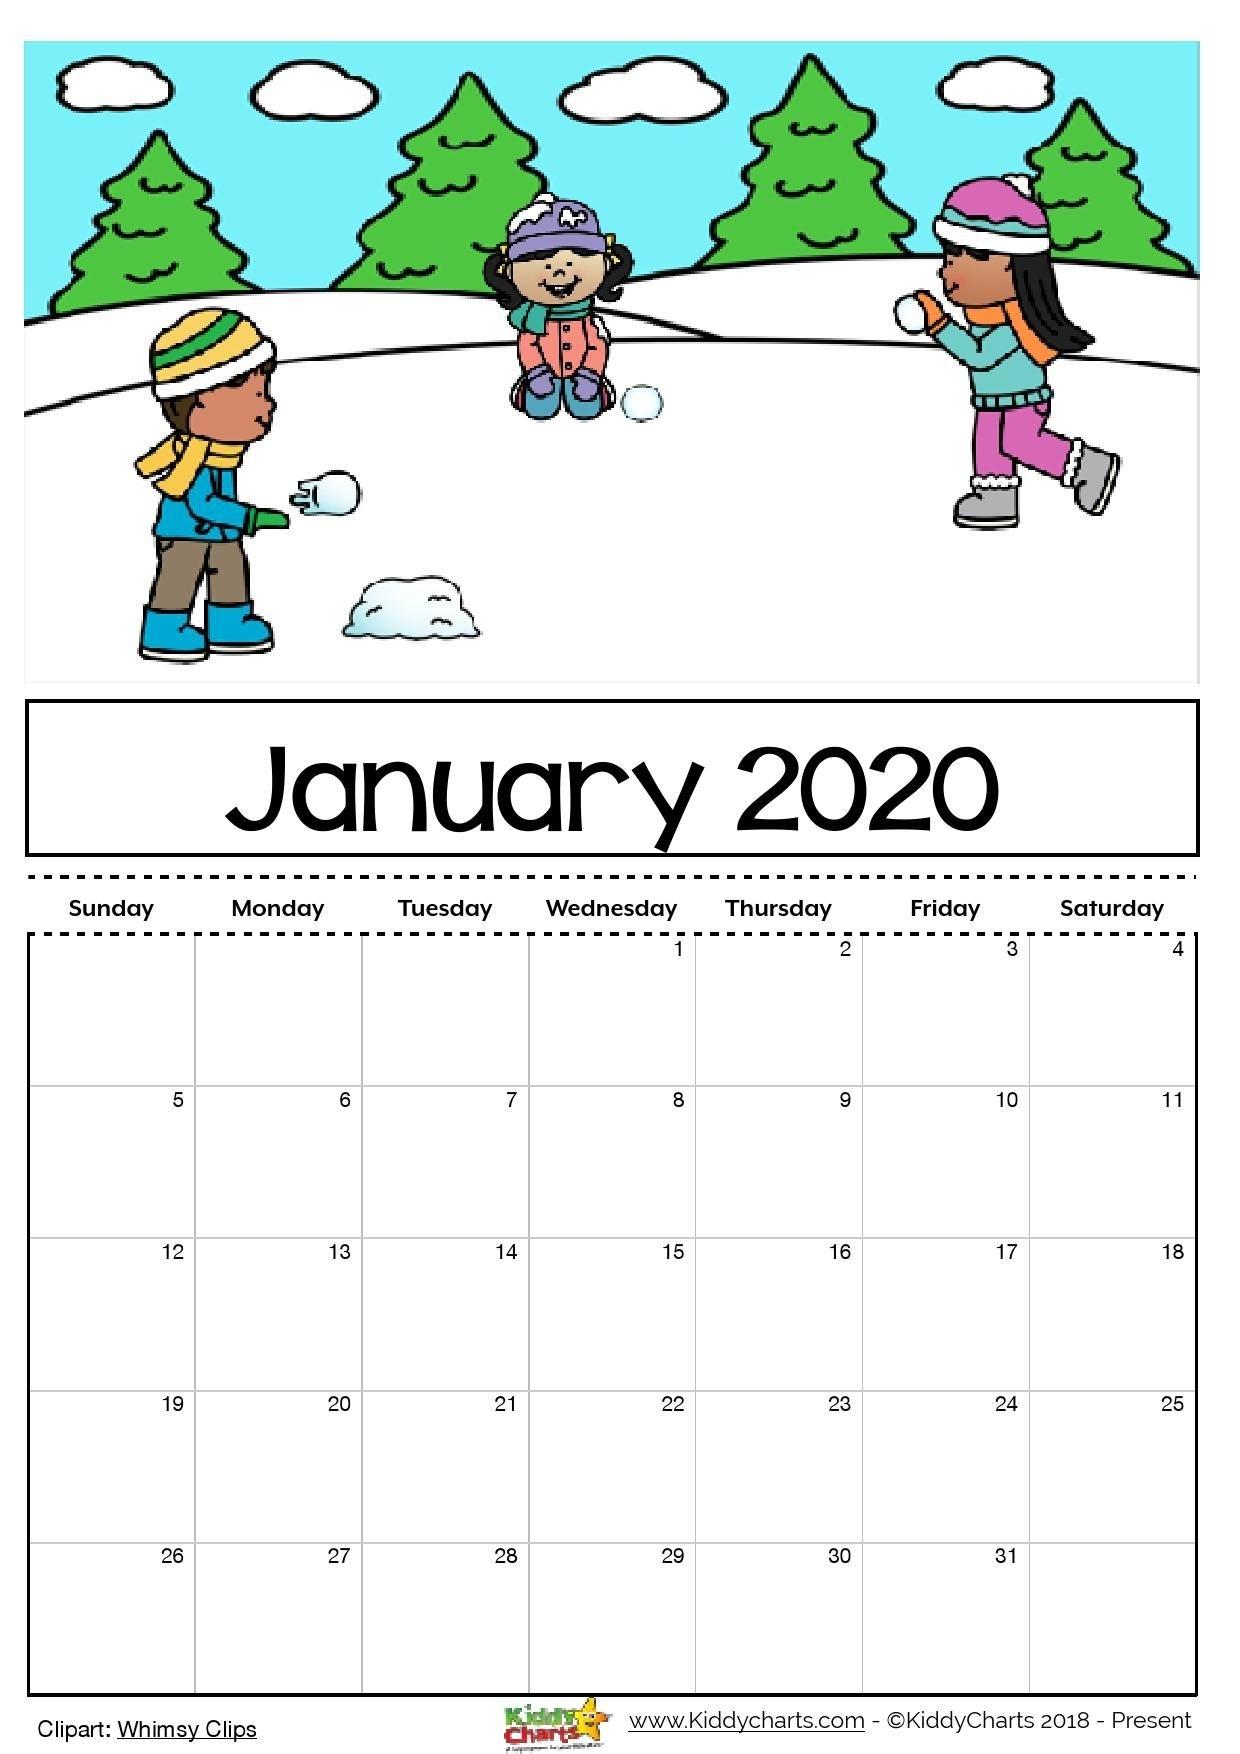 Check Out Our Free Editable 2020 Calendar Available For November Calendar Template Kindergarten